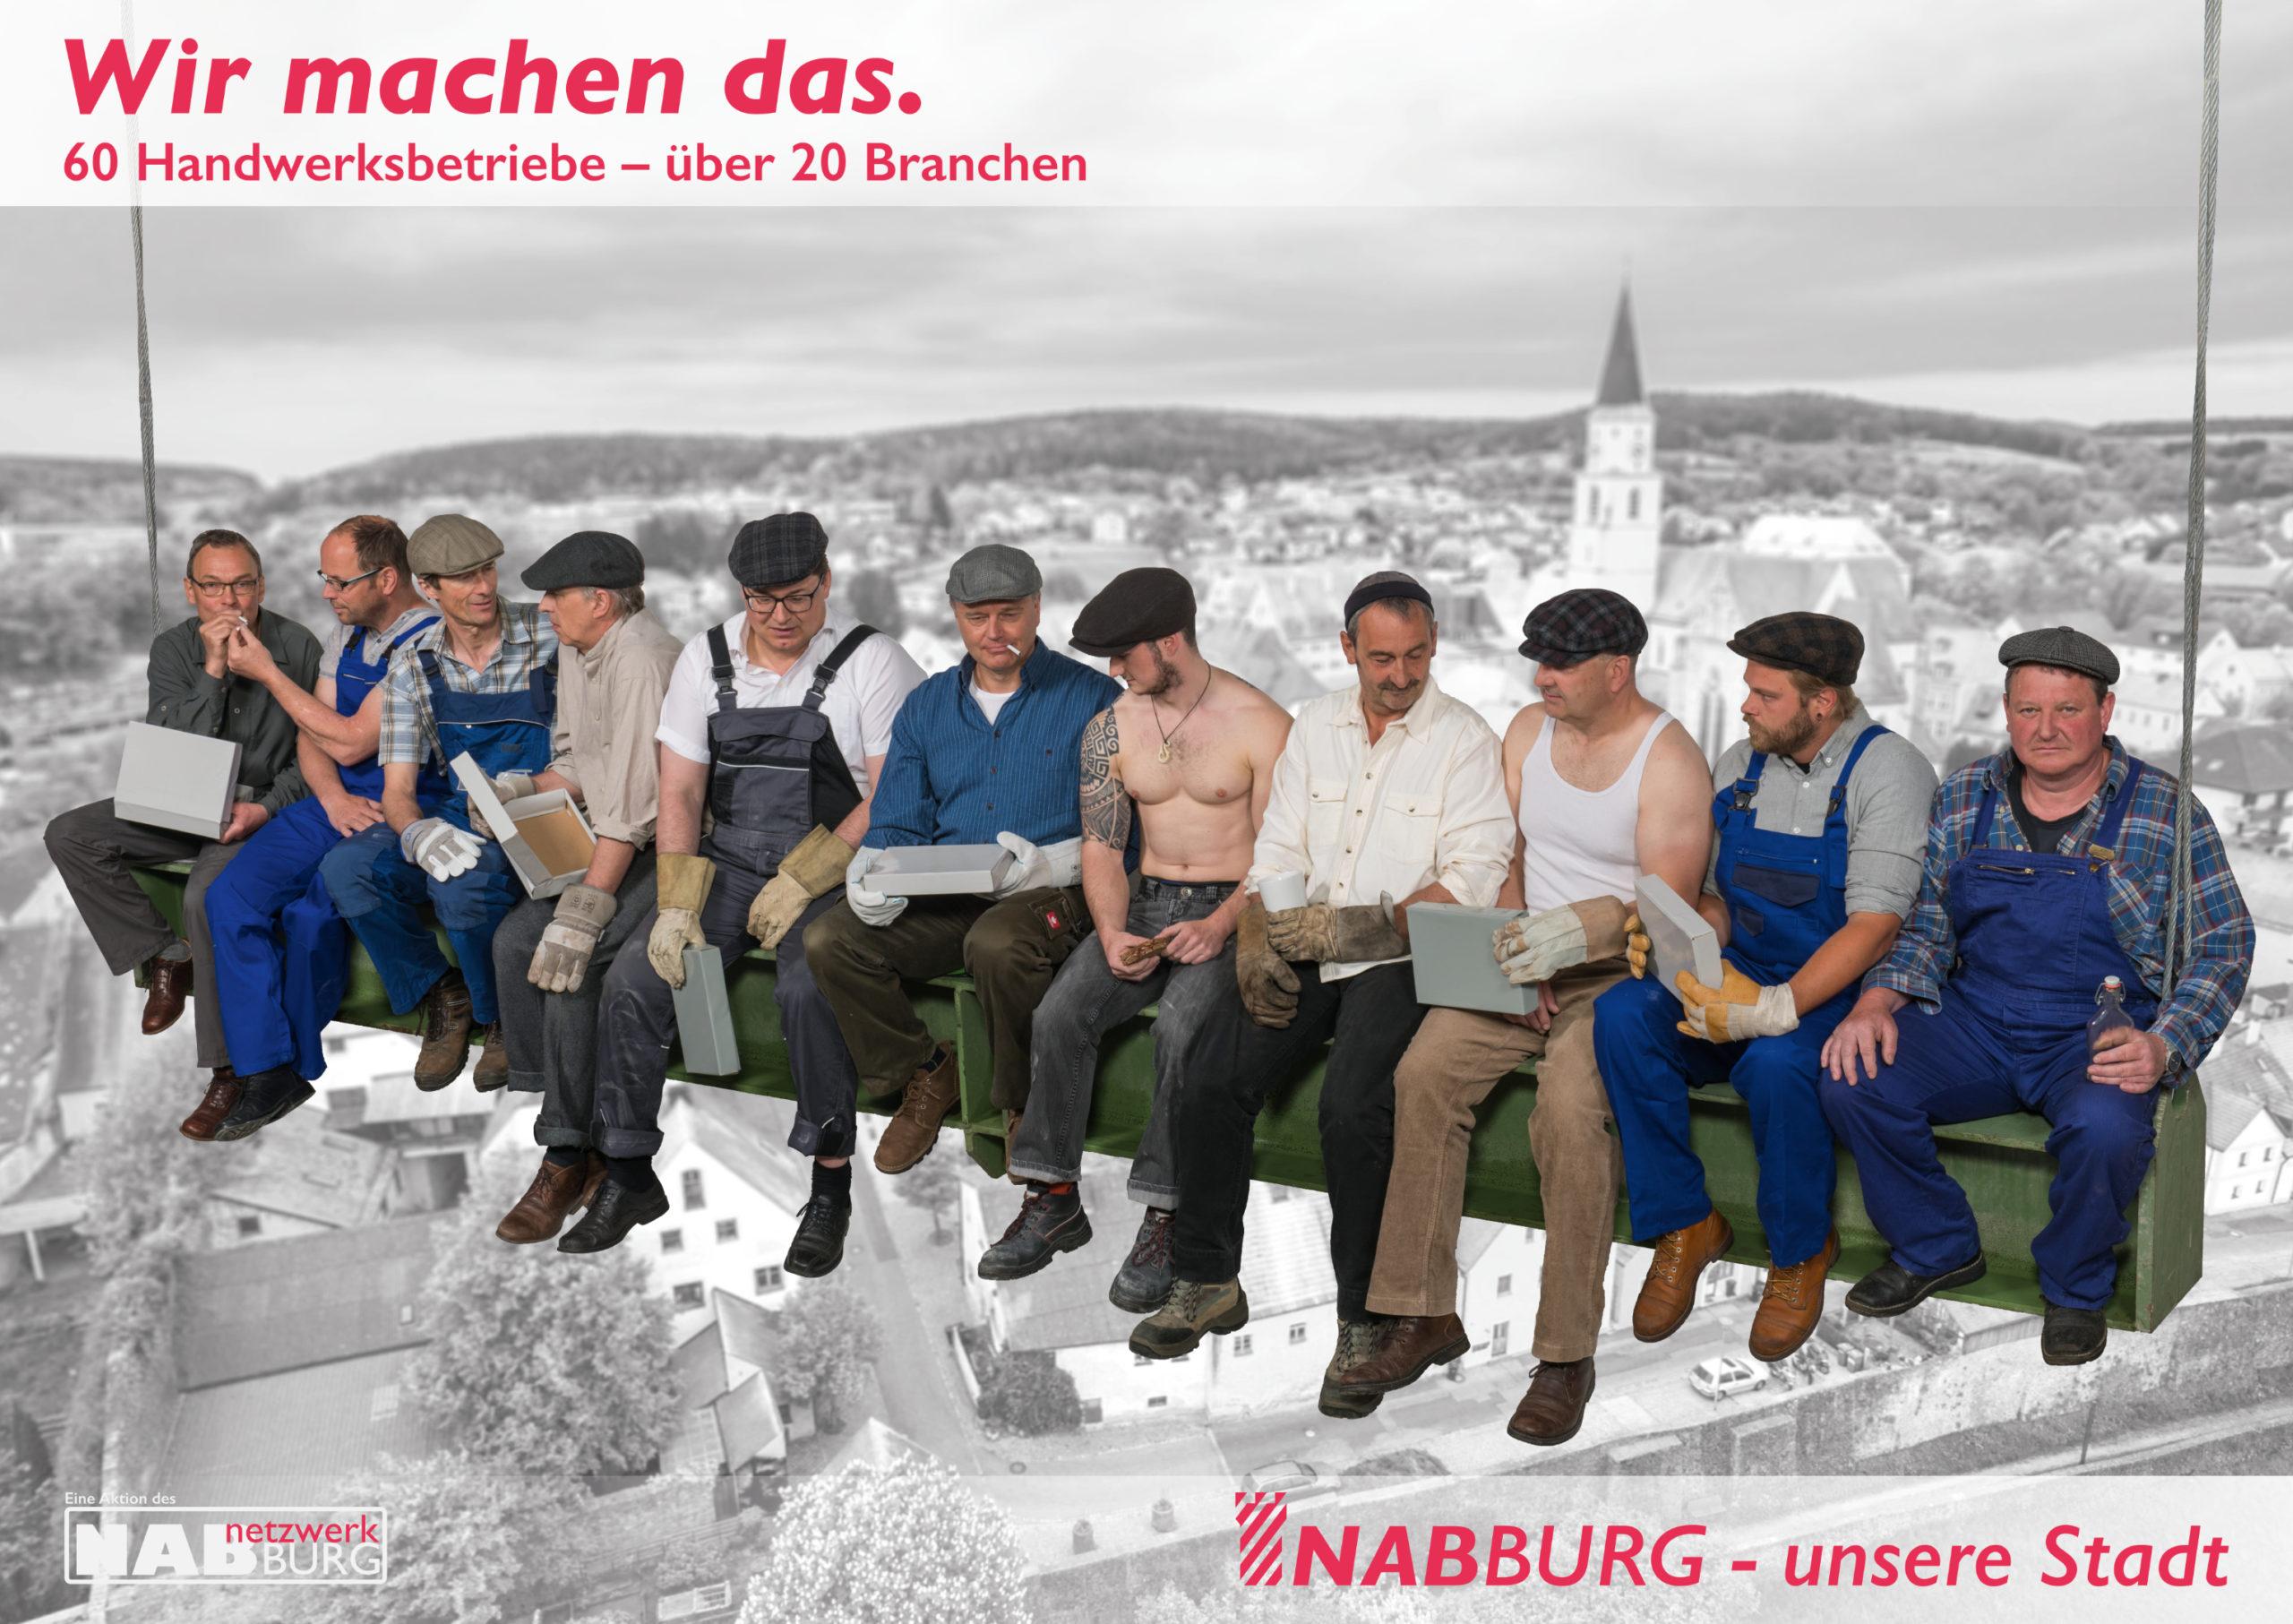 Erstes Plakat der Imagekampagne nach dem Pressefoto Lunch a-top a Scyscaper_Fotografen Klaus Kurz, Marco Linke_Grafik und Montage Wolfgang Engel, © netzwerkNABburg